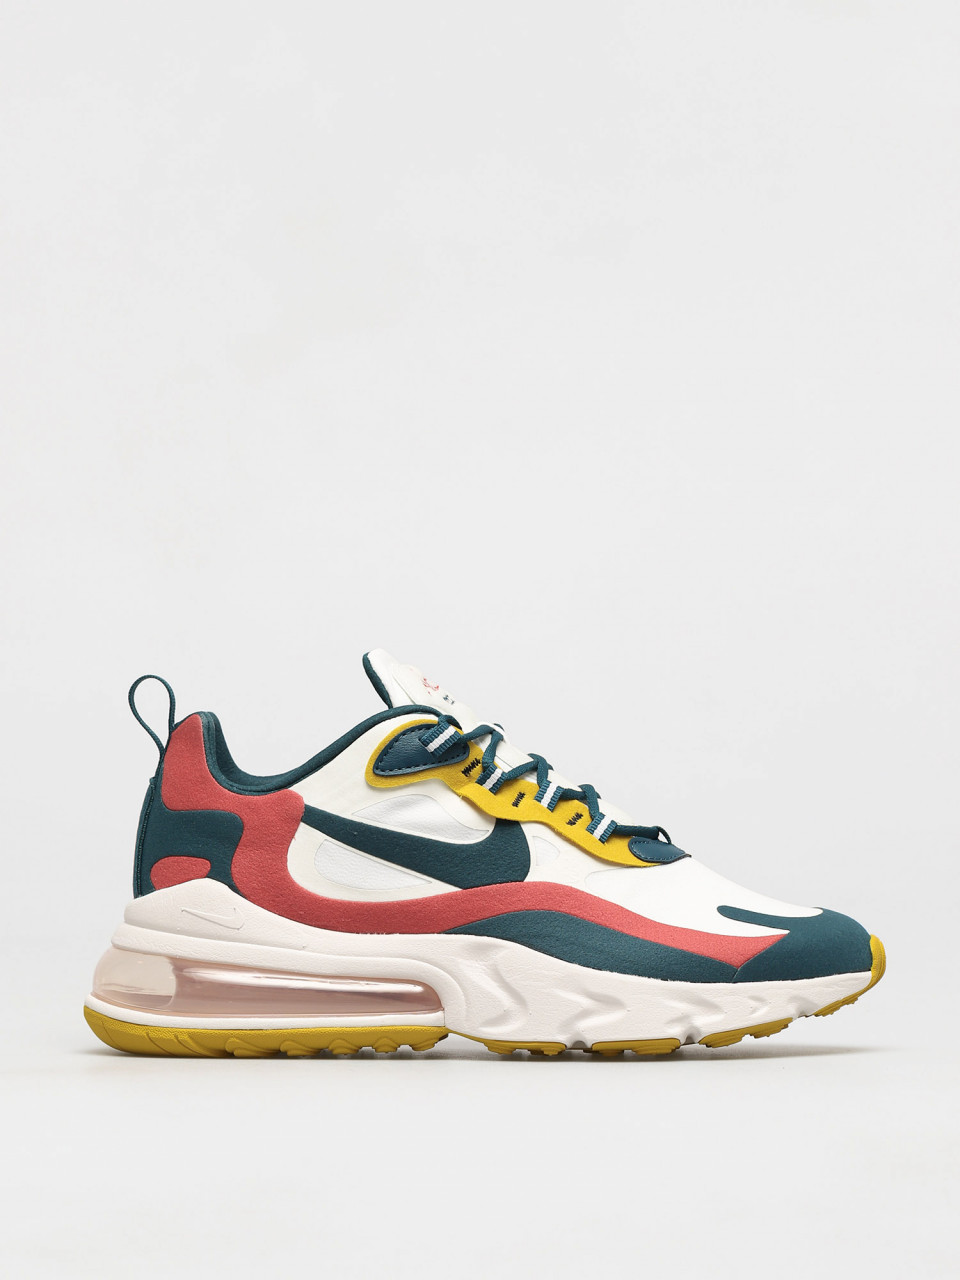 Nike Air Max 270 React Sneaker Summit White/Midnight Turq/Pueblo Red